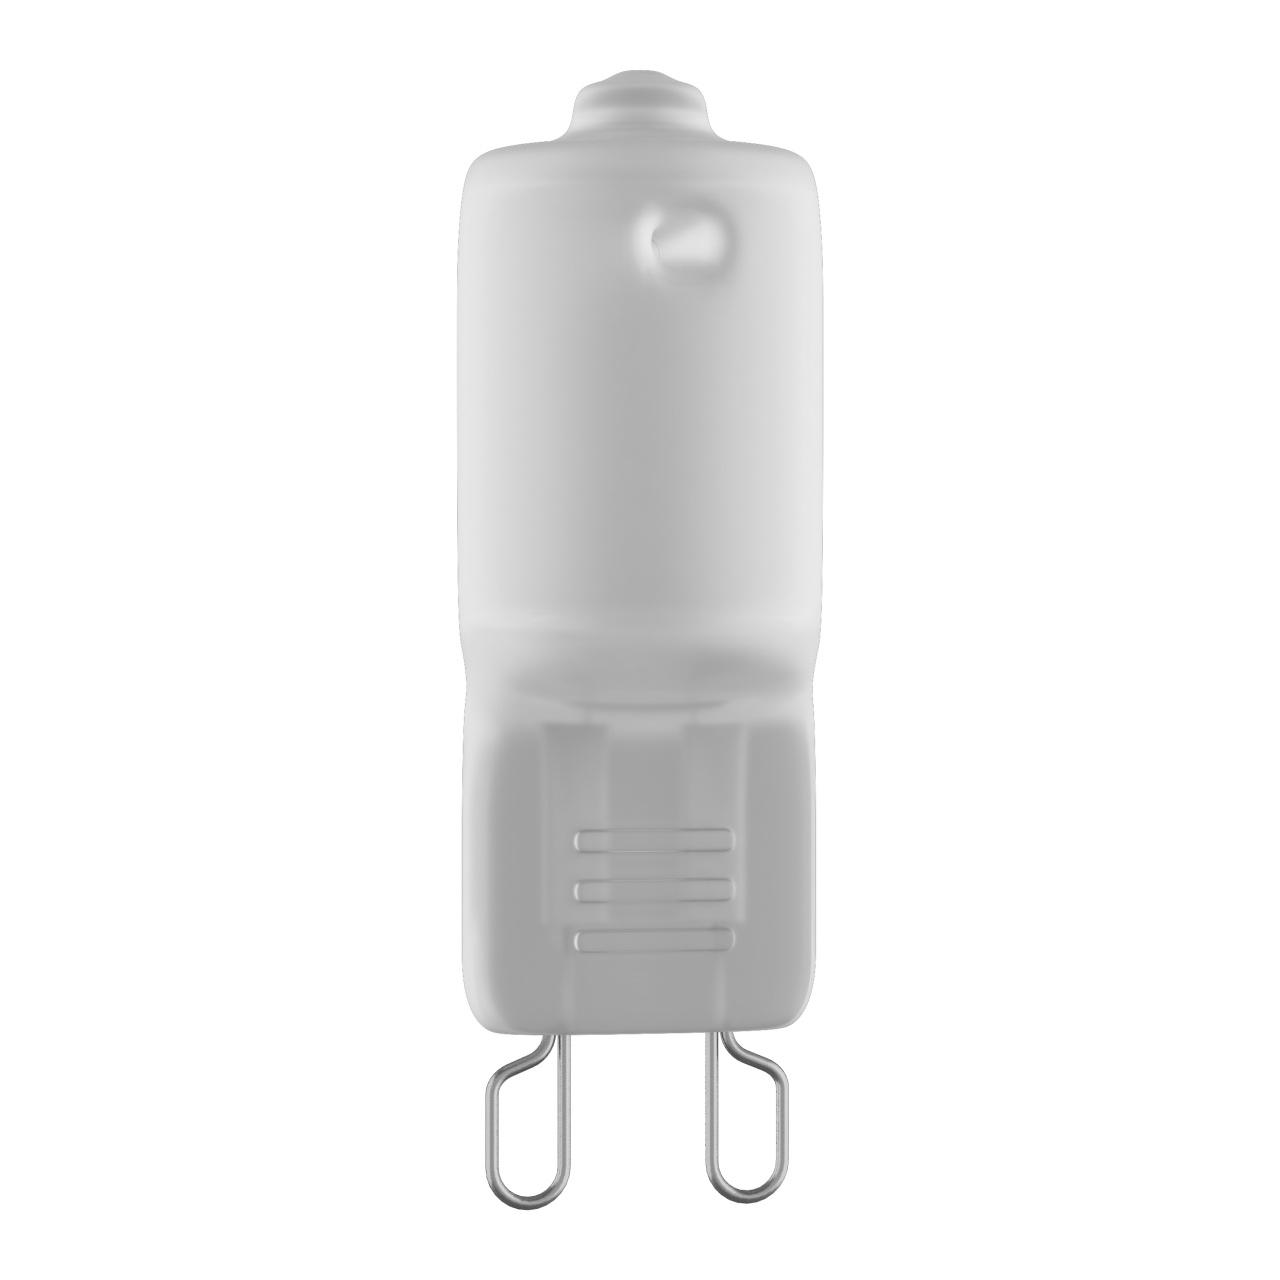 Лампа HAL 220V JC G9 40W FR RA100 2800K 2000H DIMM Lightstar 922033